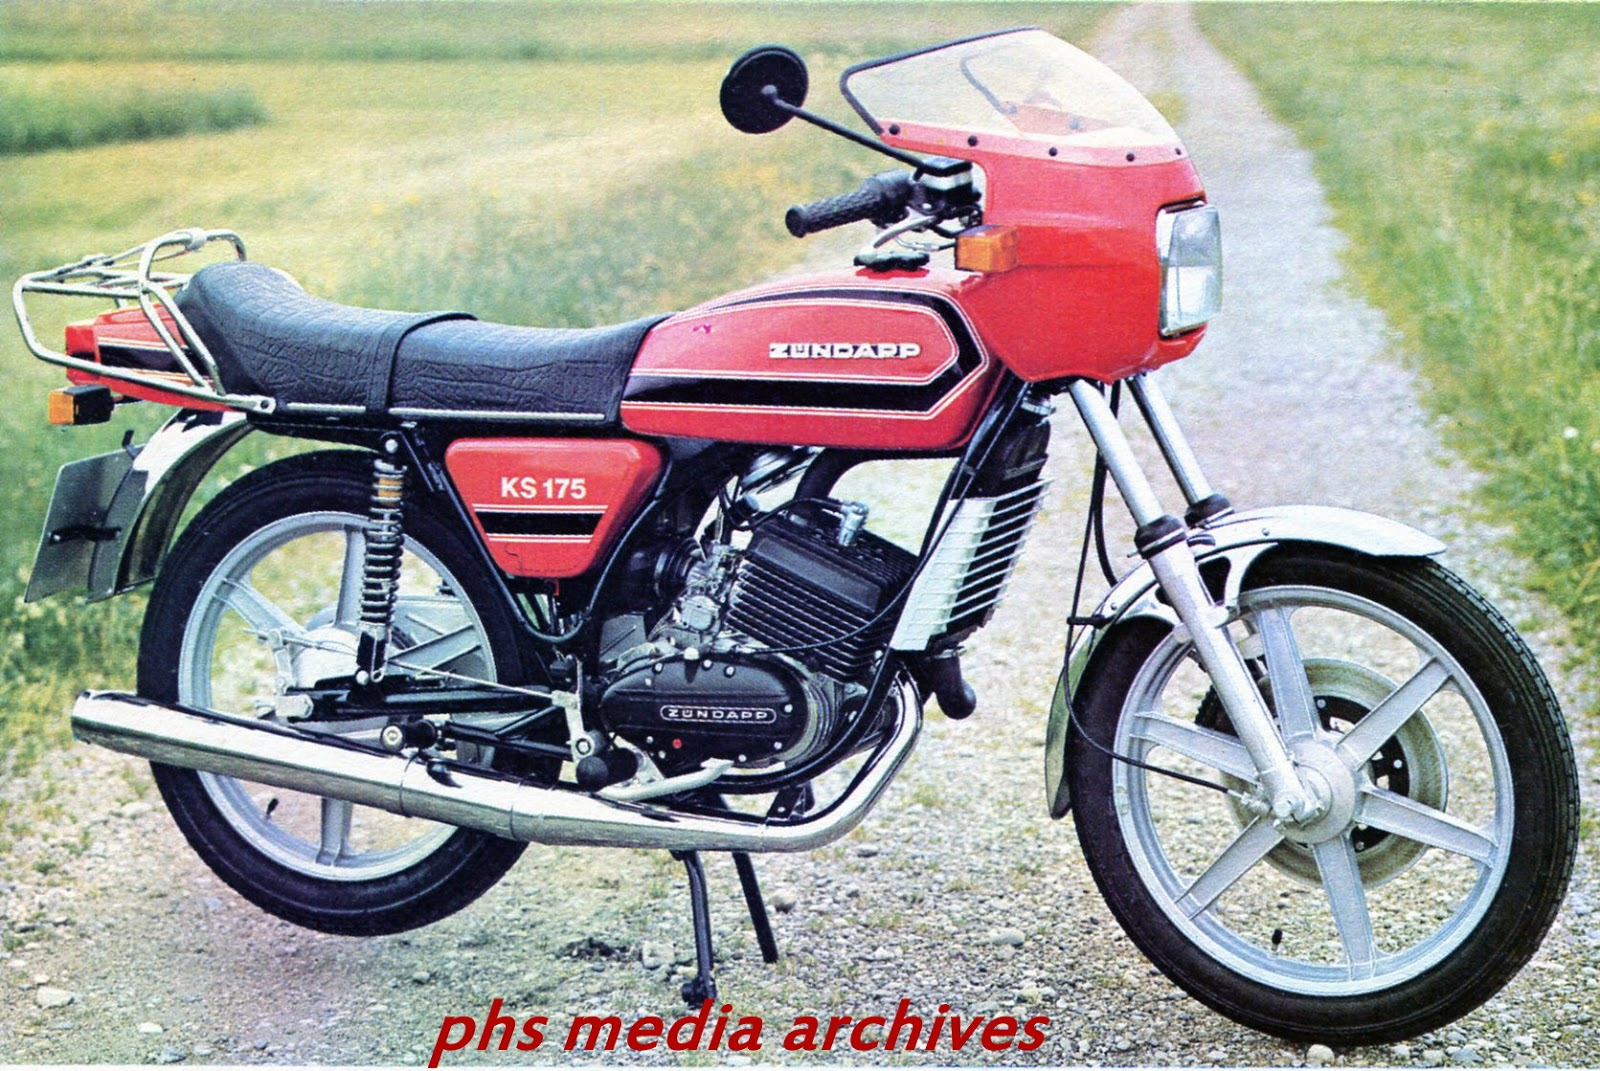 Zundapp S 1980 Motorcycle Line Up Phscollectorcarworld